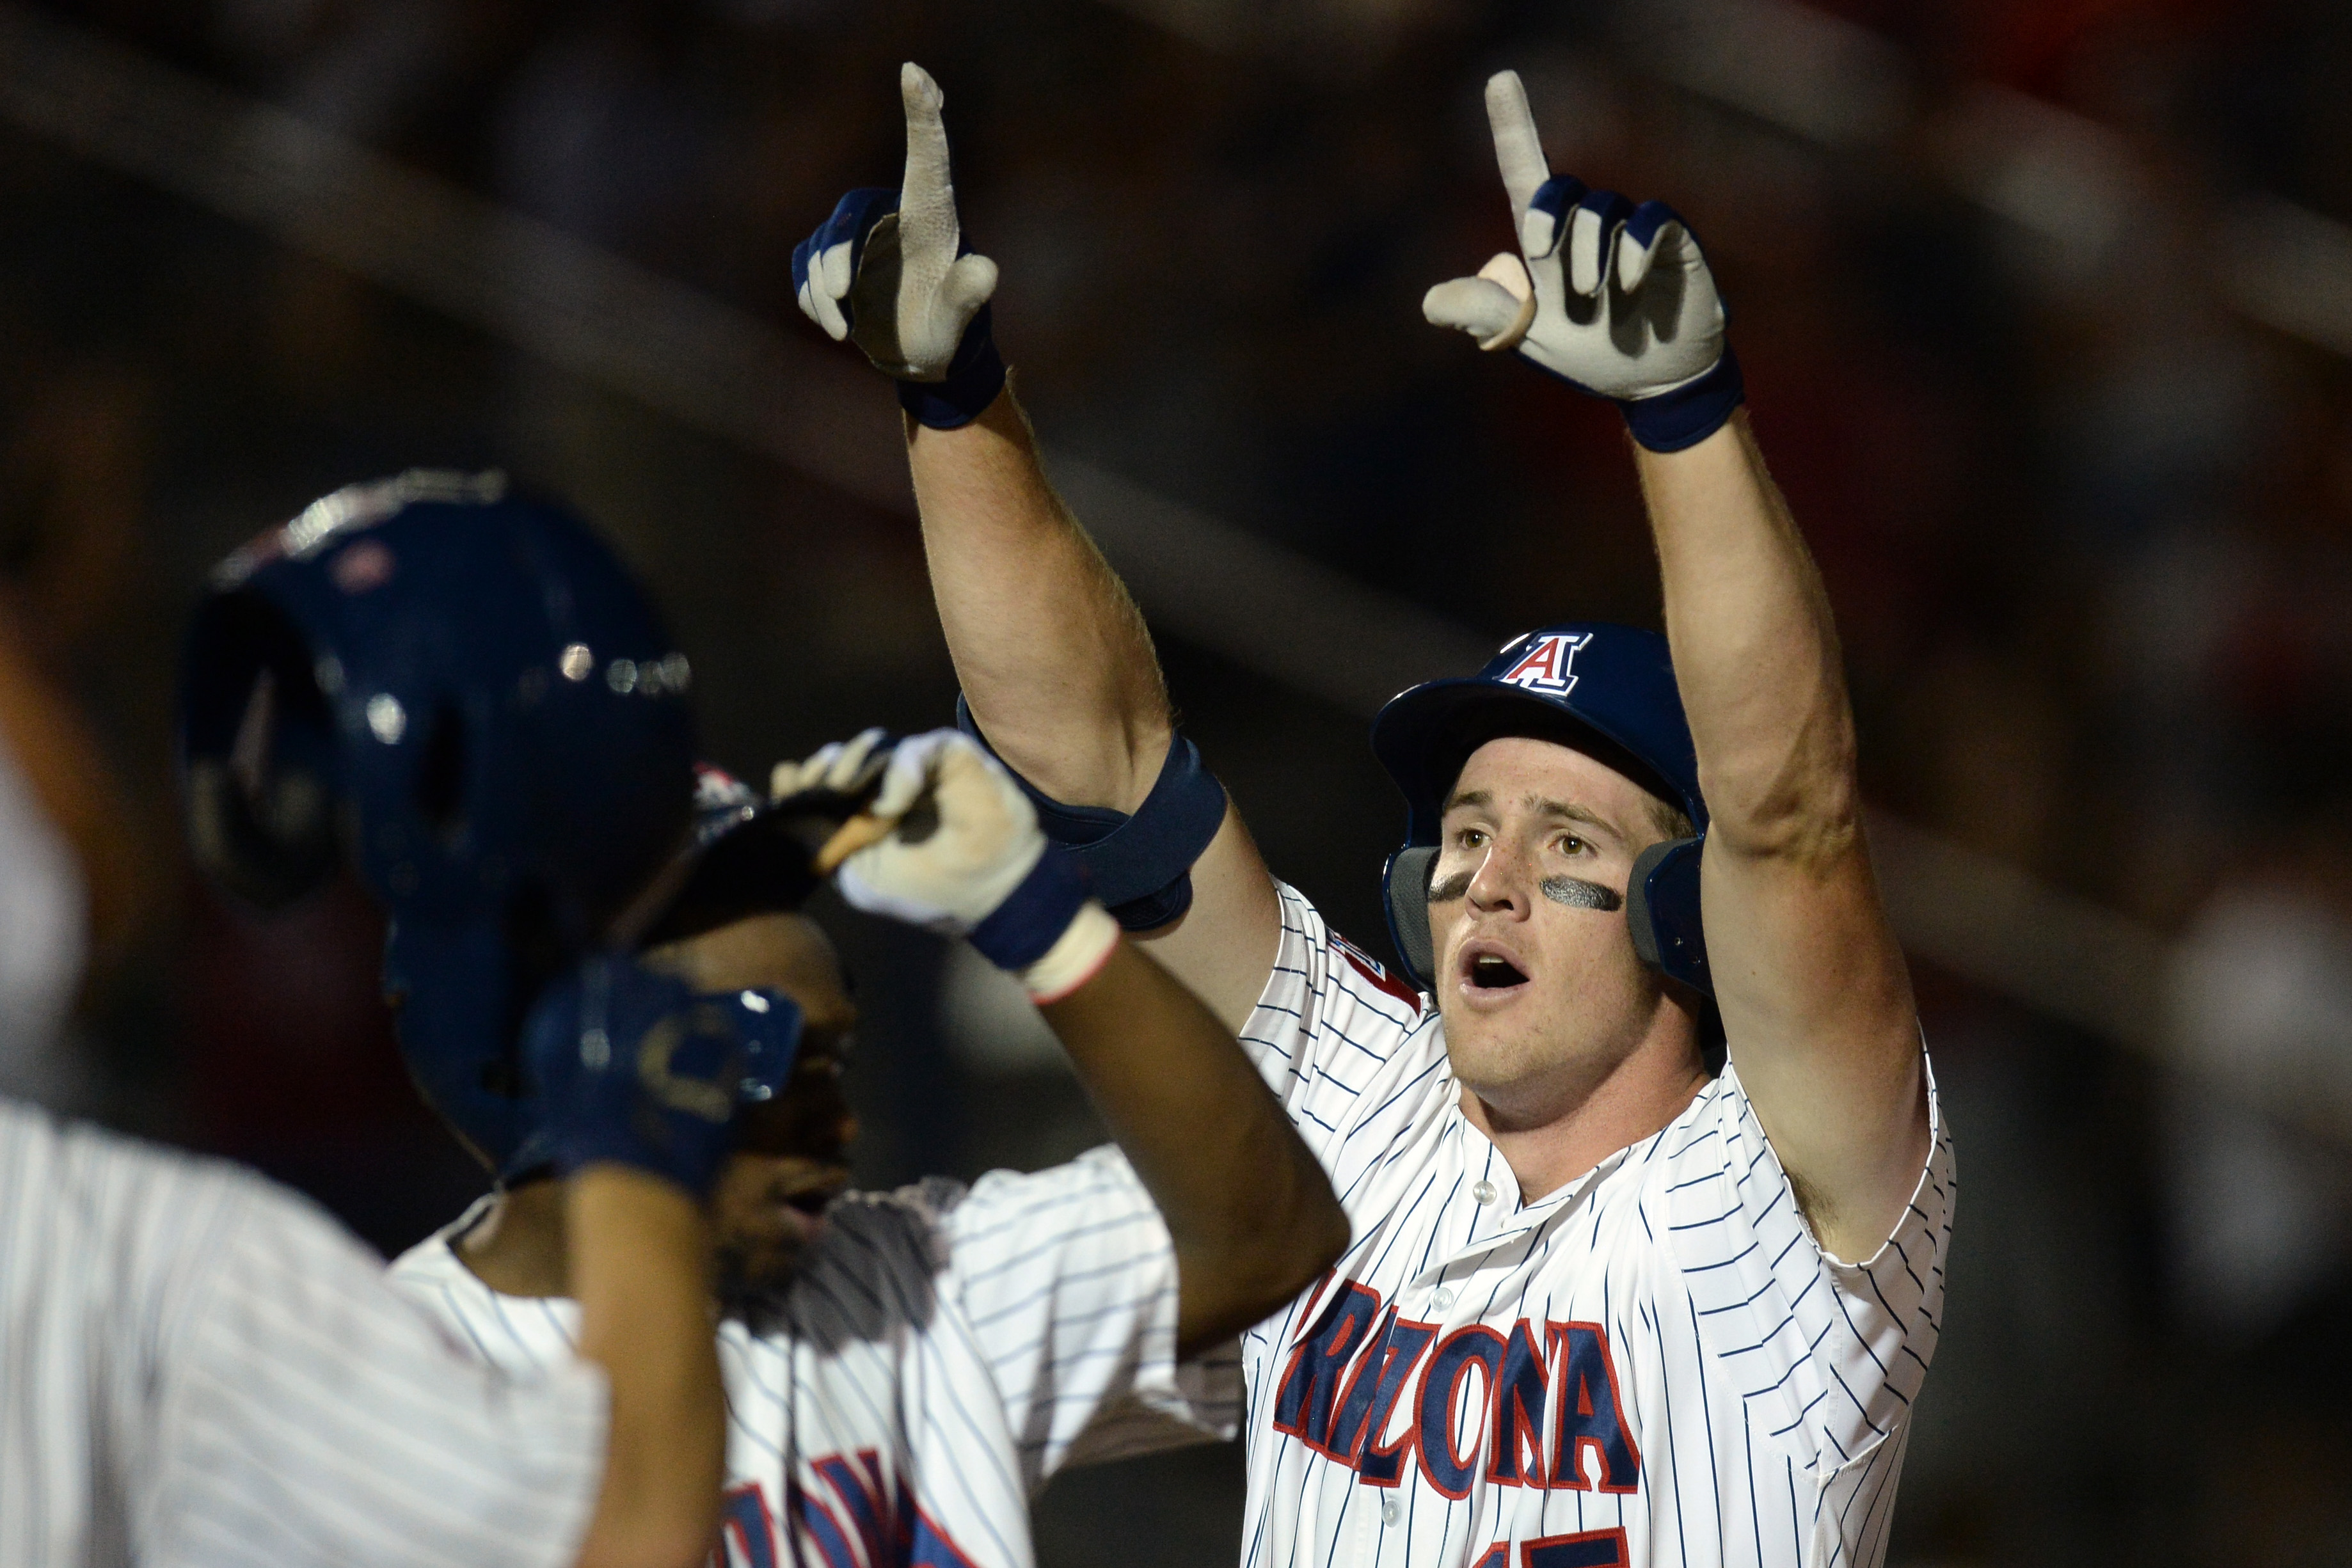 Arizona-Wildcats-baseball-Jacob-berry-transfer-lsu-tigers-jay-Johnson-cws